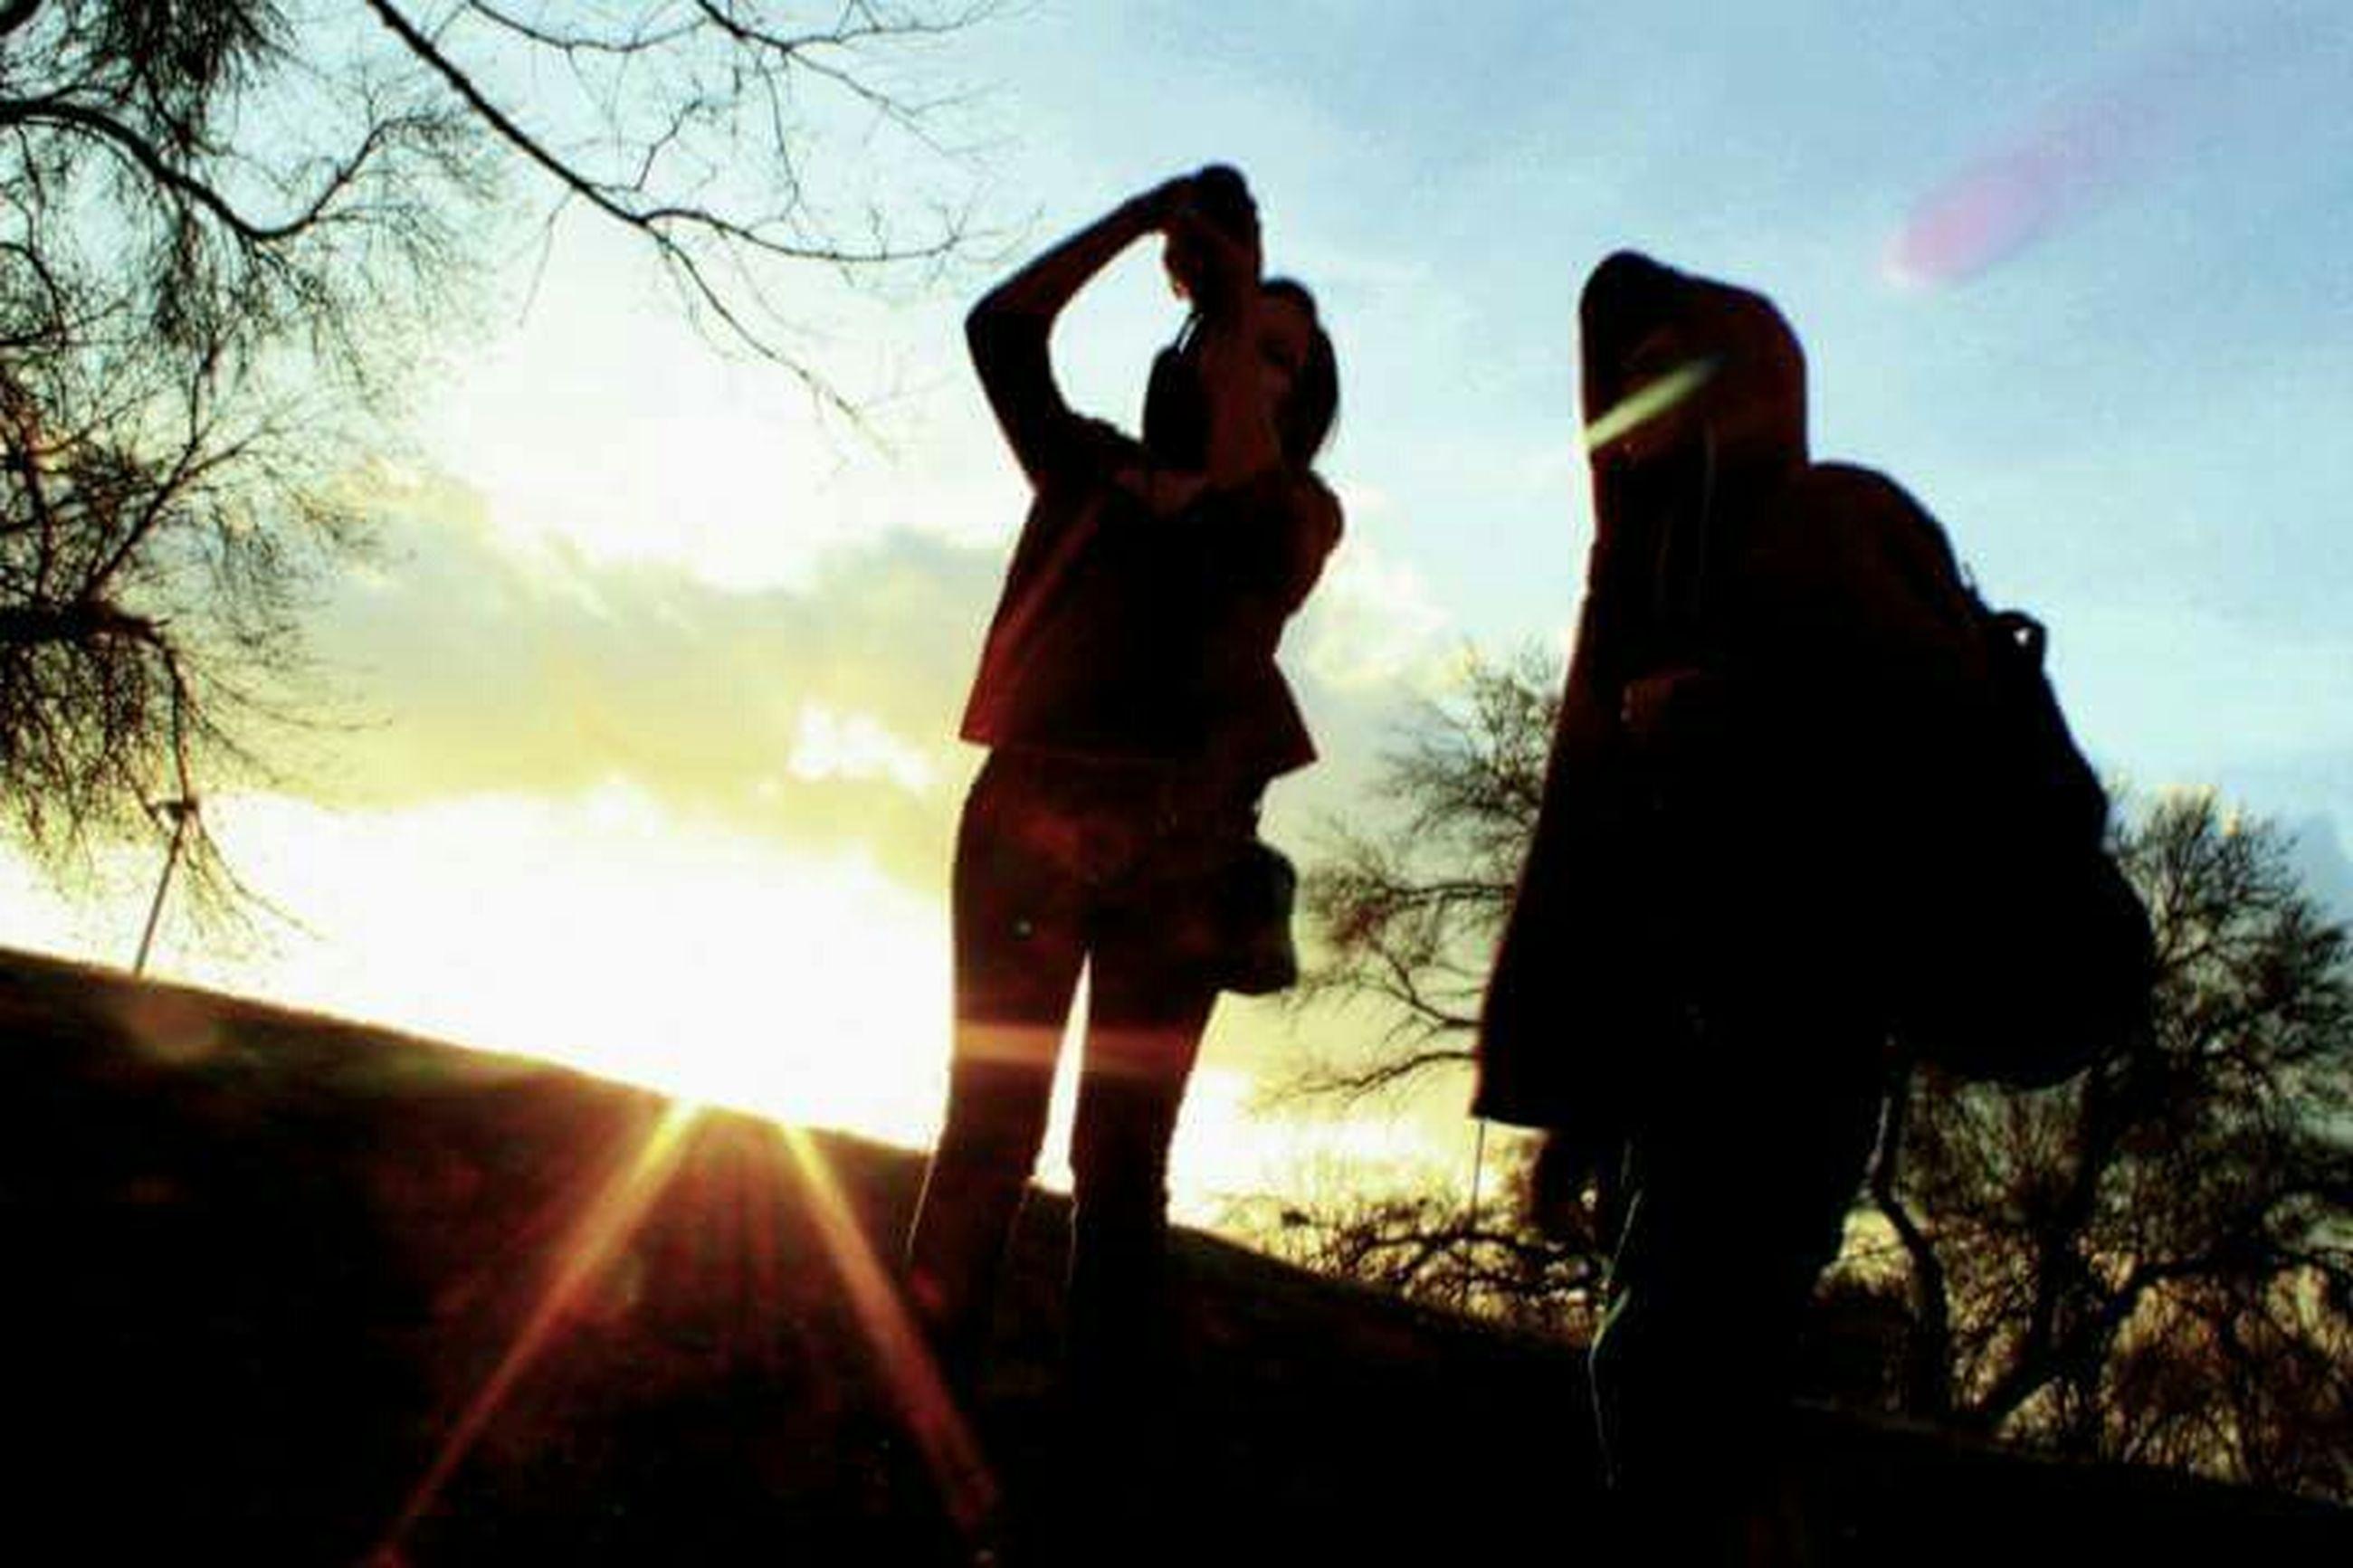 sun, silhouette, sunset, sky, sunbeam, sunlight, lens flare, lifestyles, leisure activity, men, full length, standing, tree, nature, rear view, cloud - sky, cloud, back lit